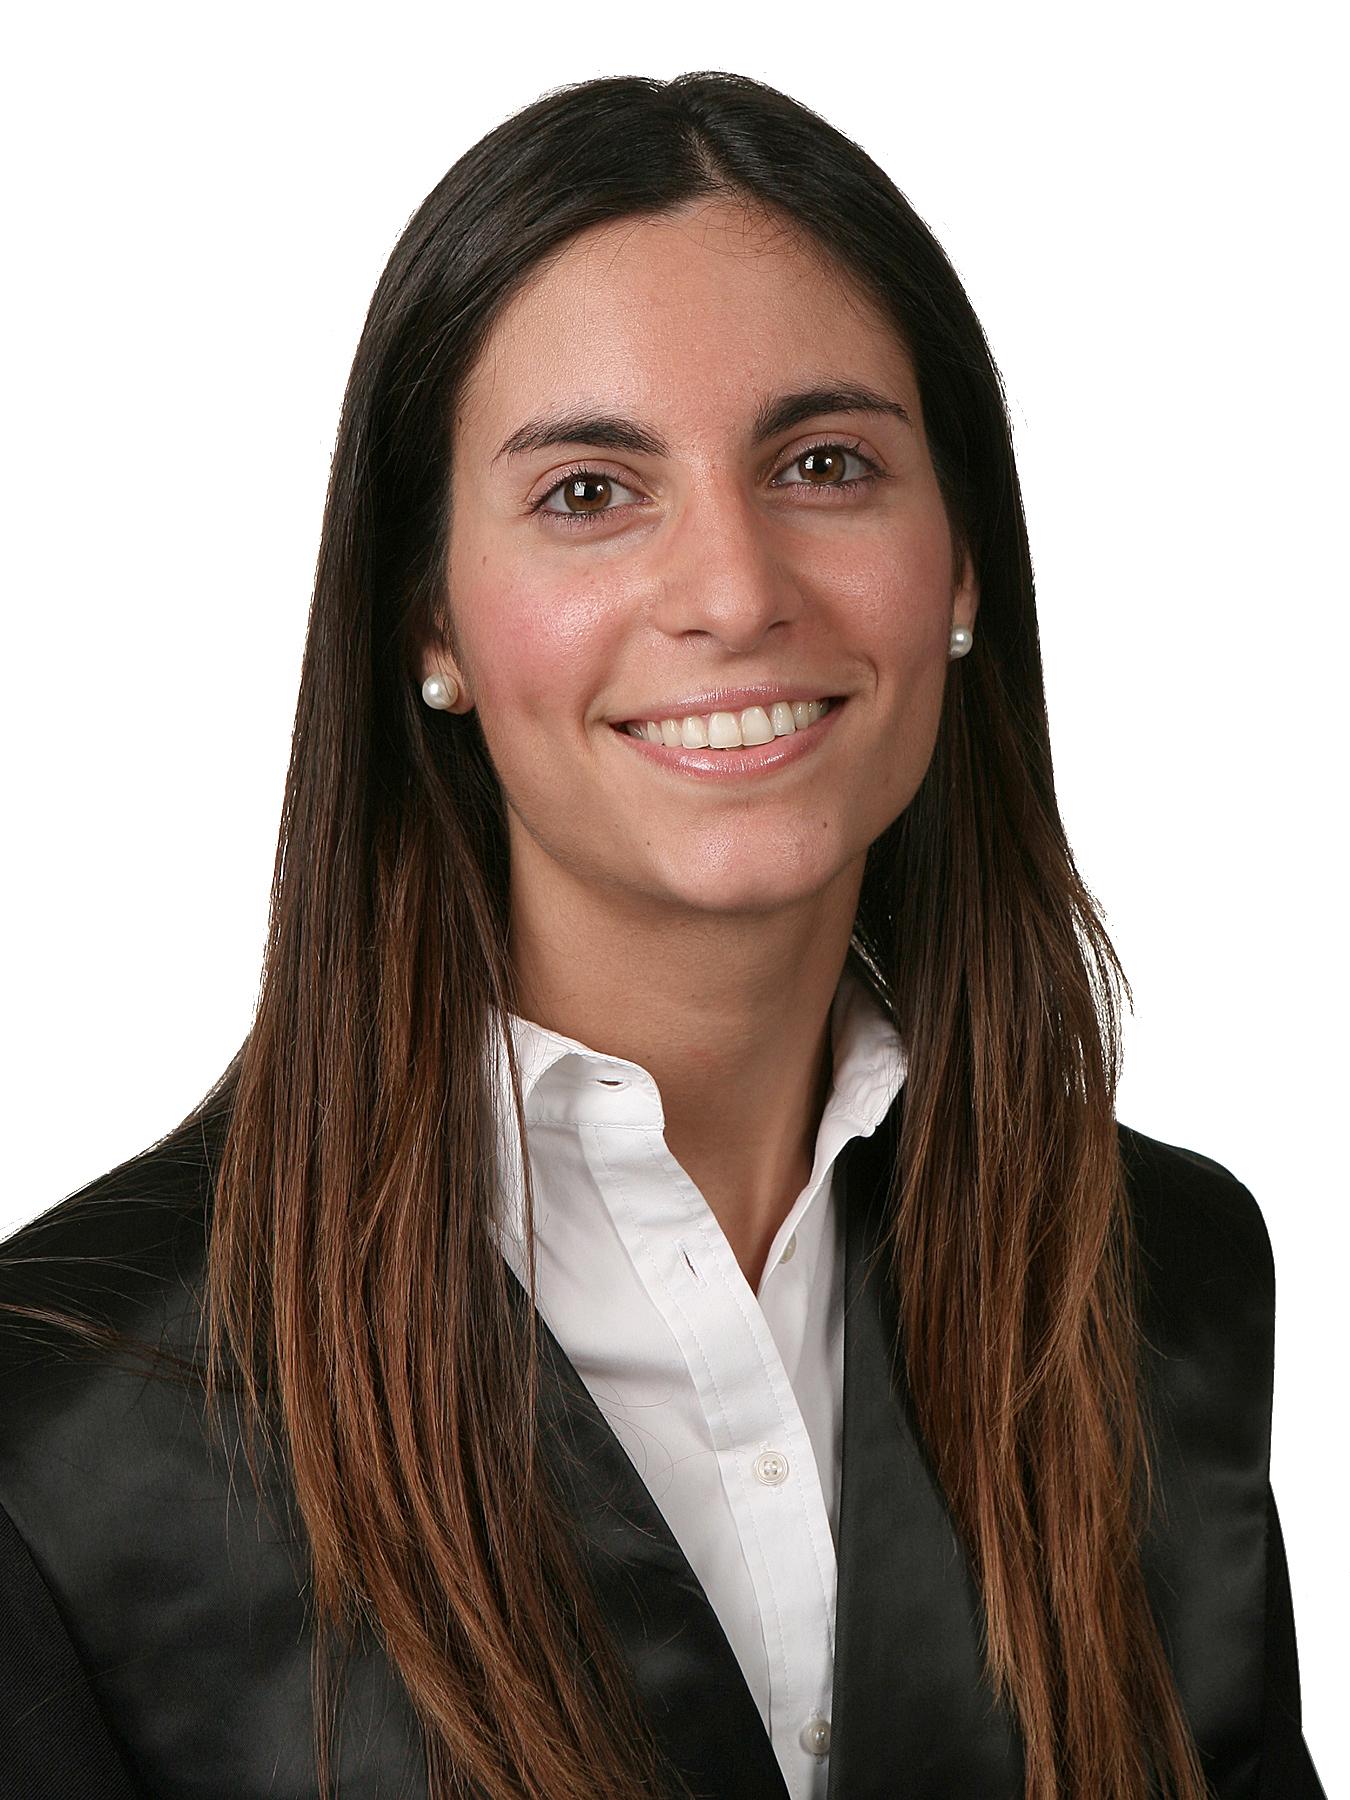 Anna Gracia Franco